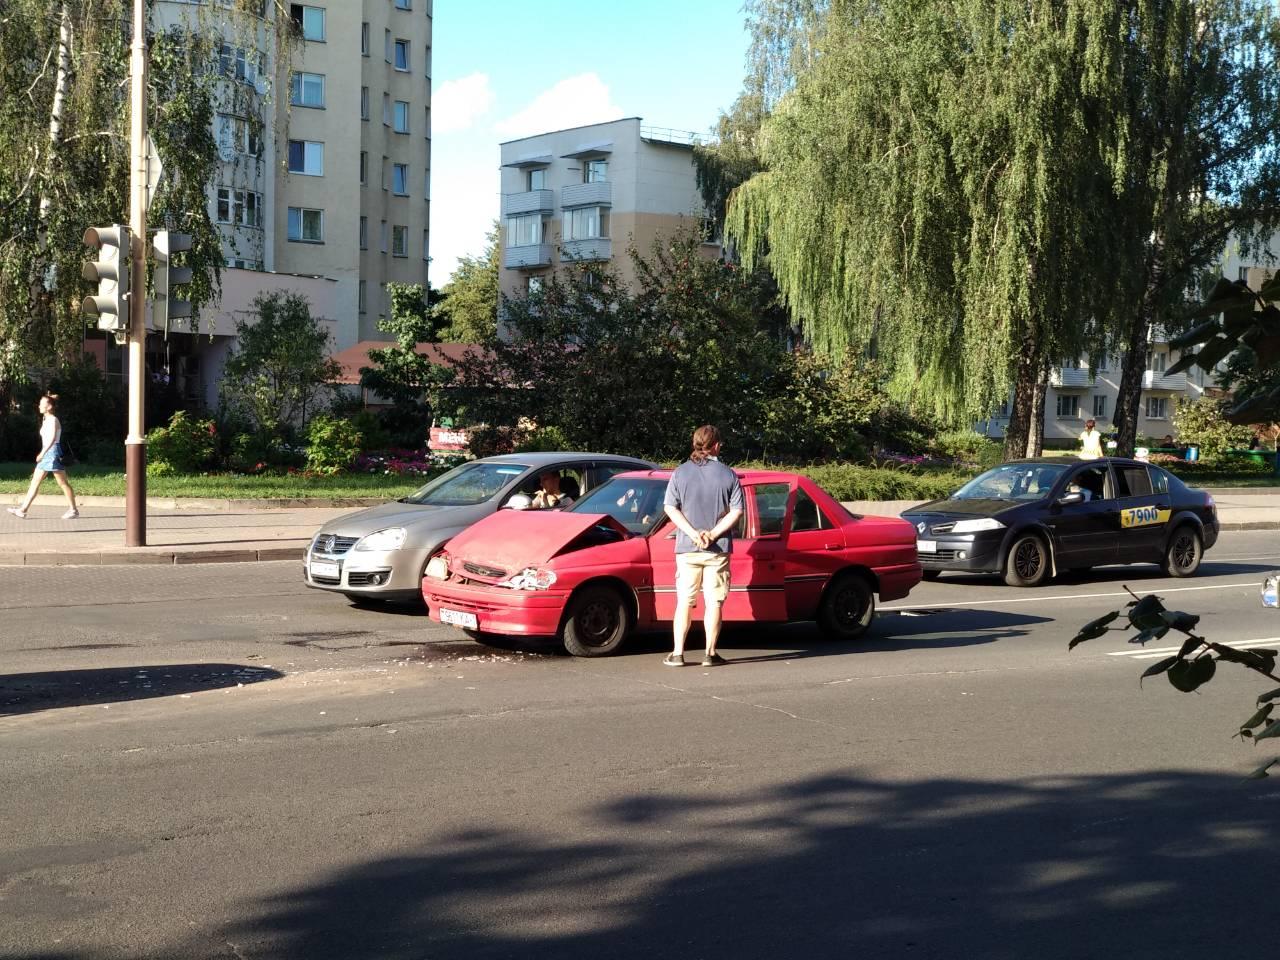 В Барановичах на улице Ленина столкнулись сразу три автомобиля (видео/фото) — Intex-press. Последние новости города Барановичи, Беларуси и Мира